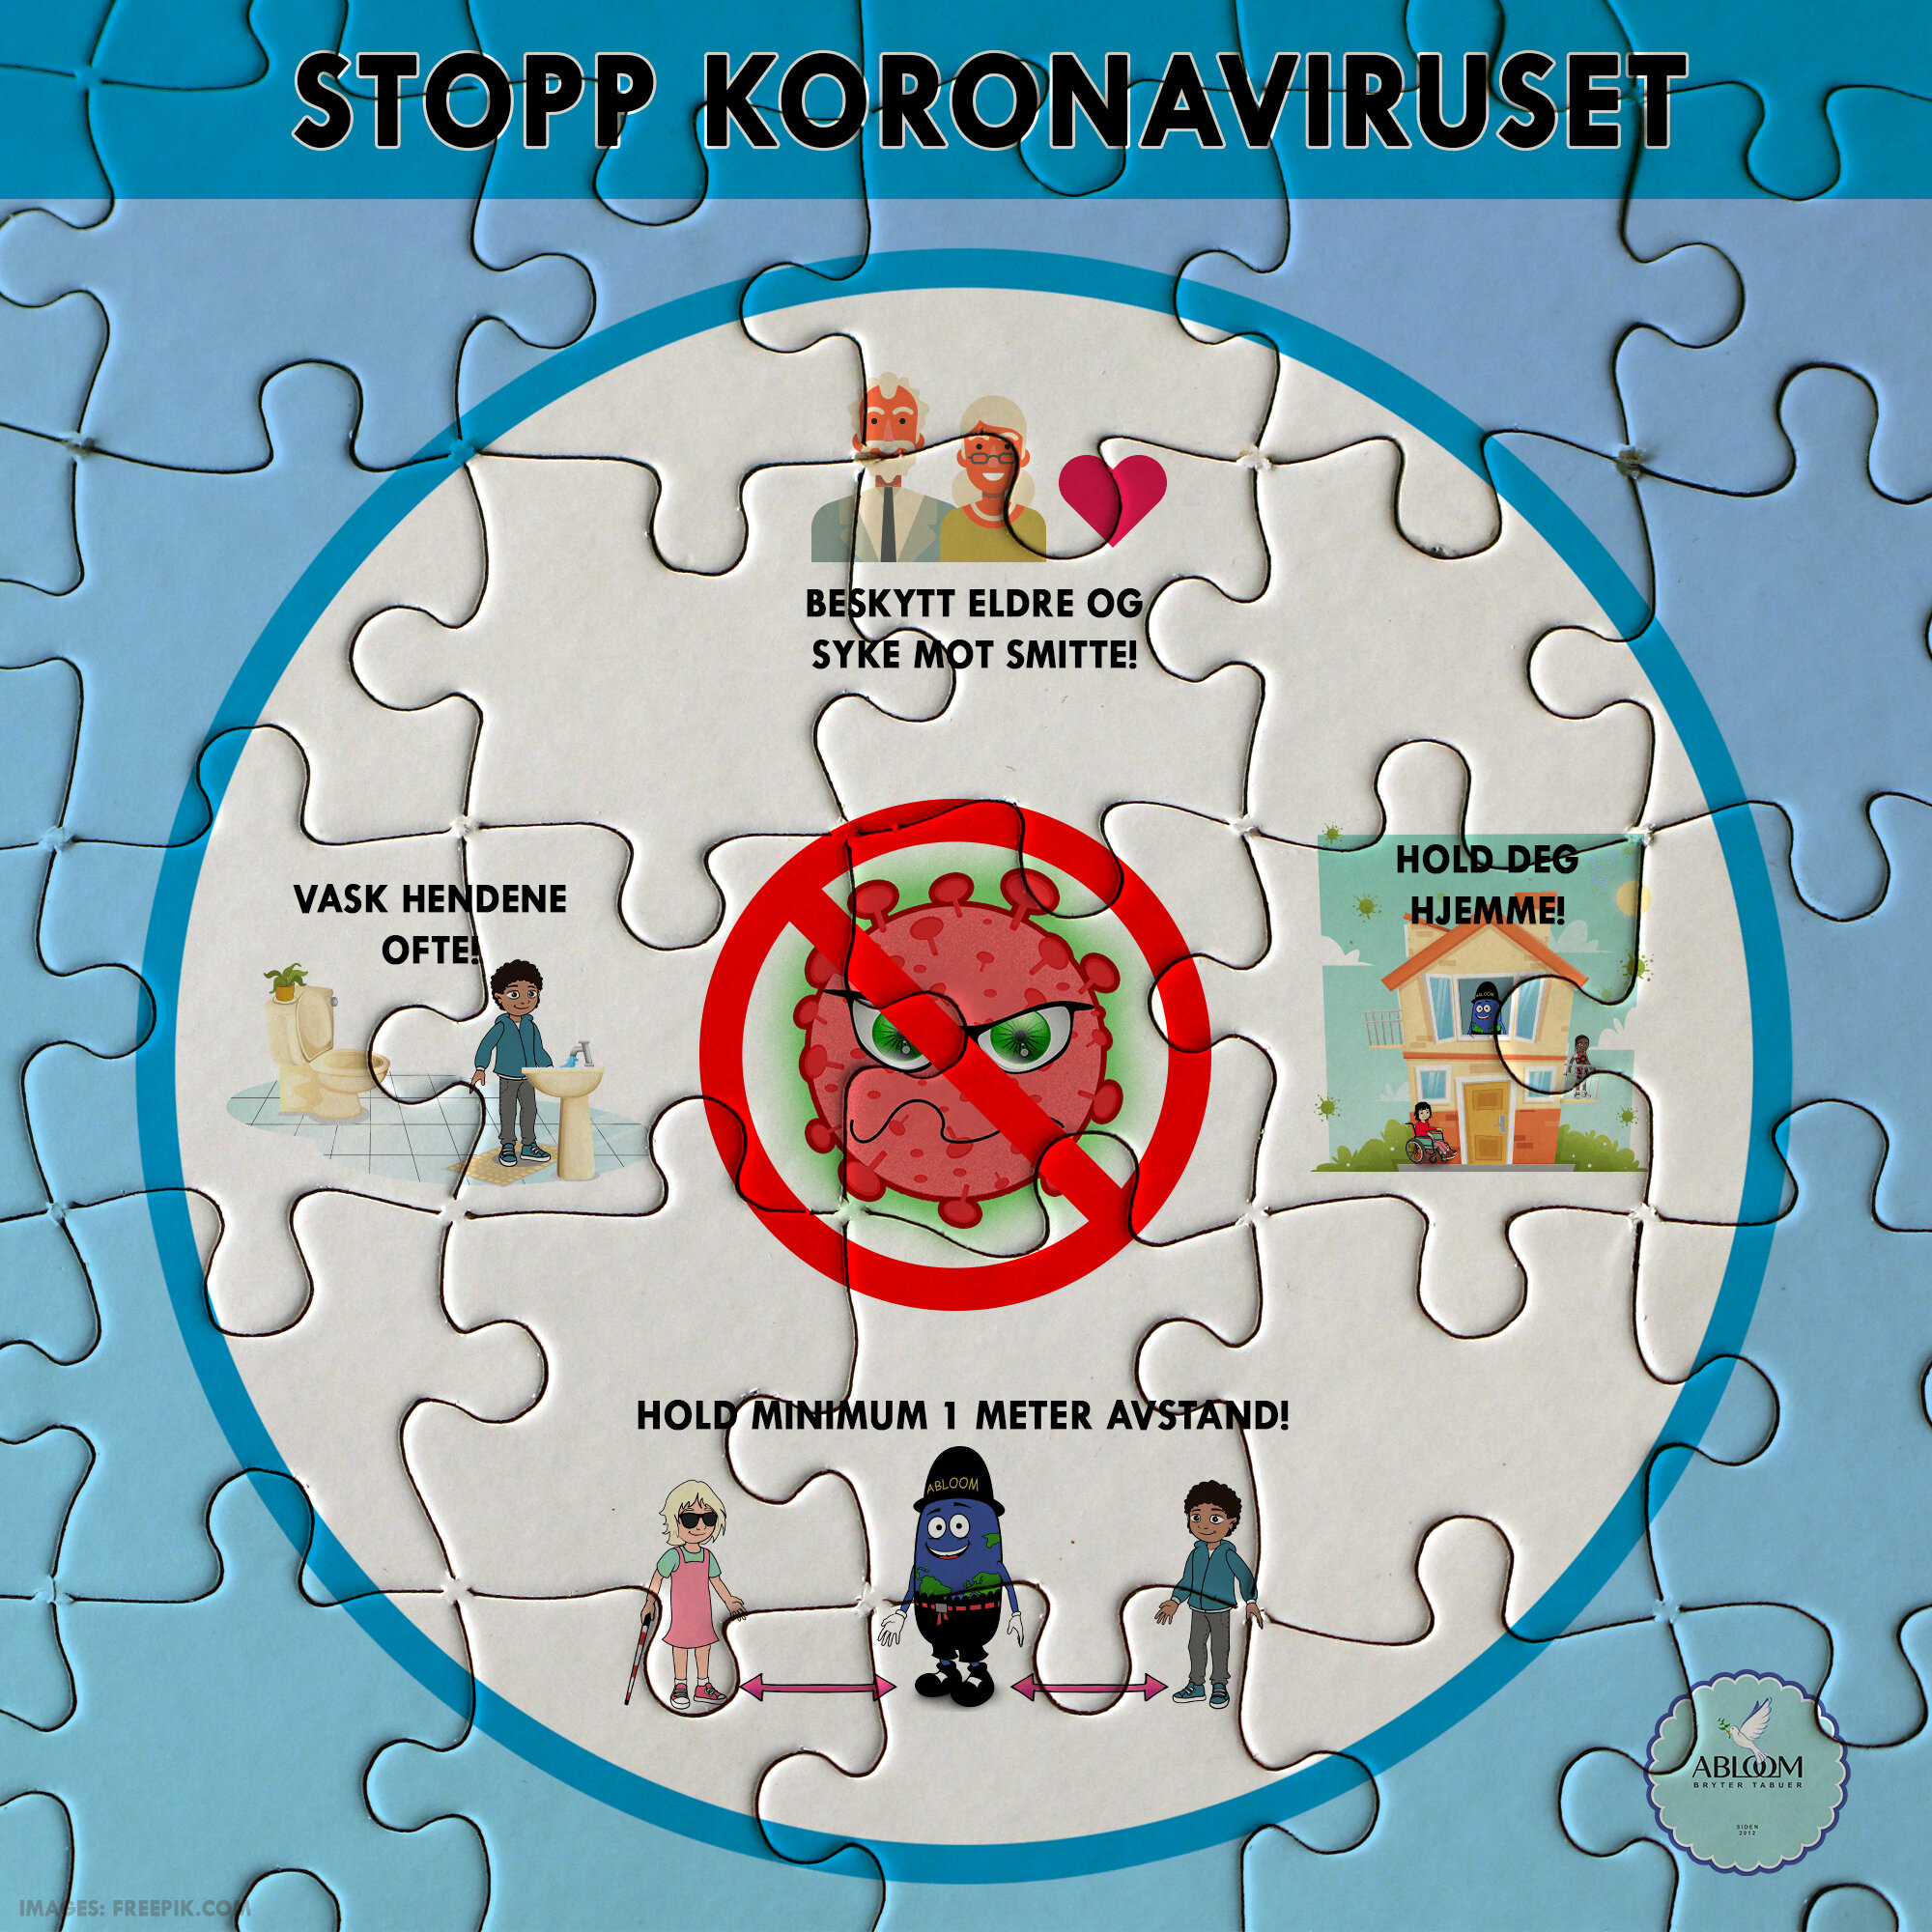 stop corona viruset v02 NO.jpg